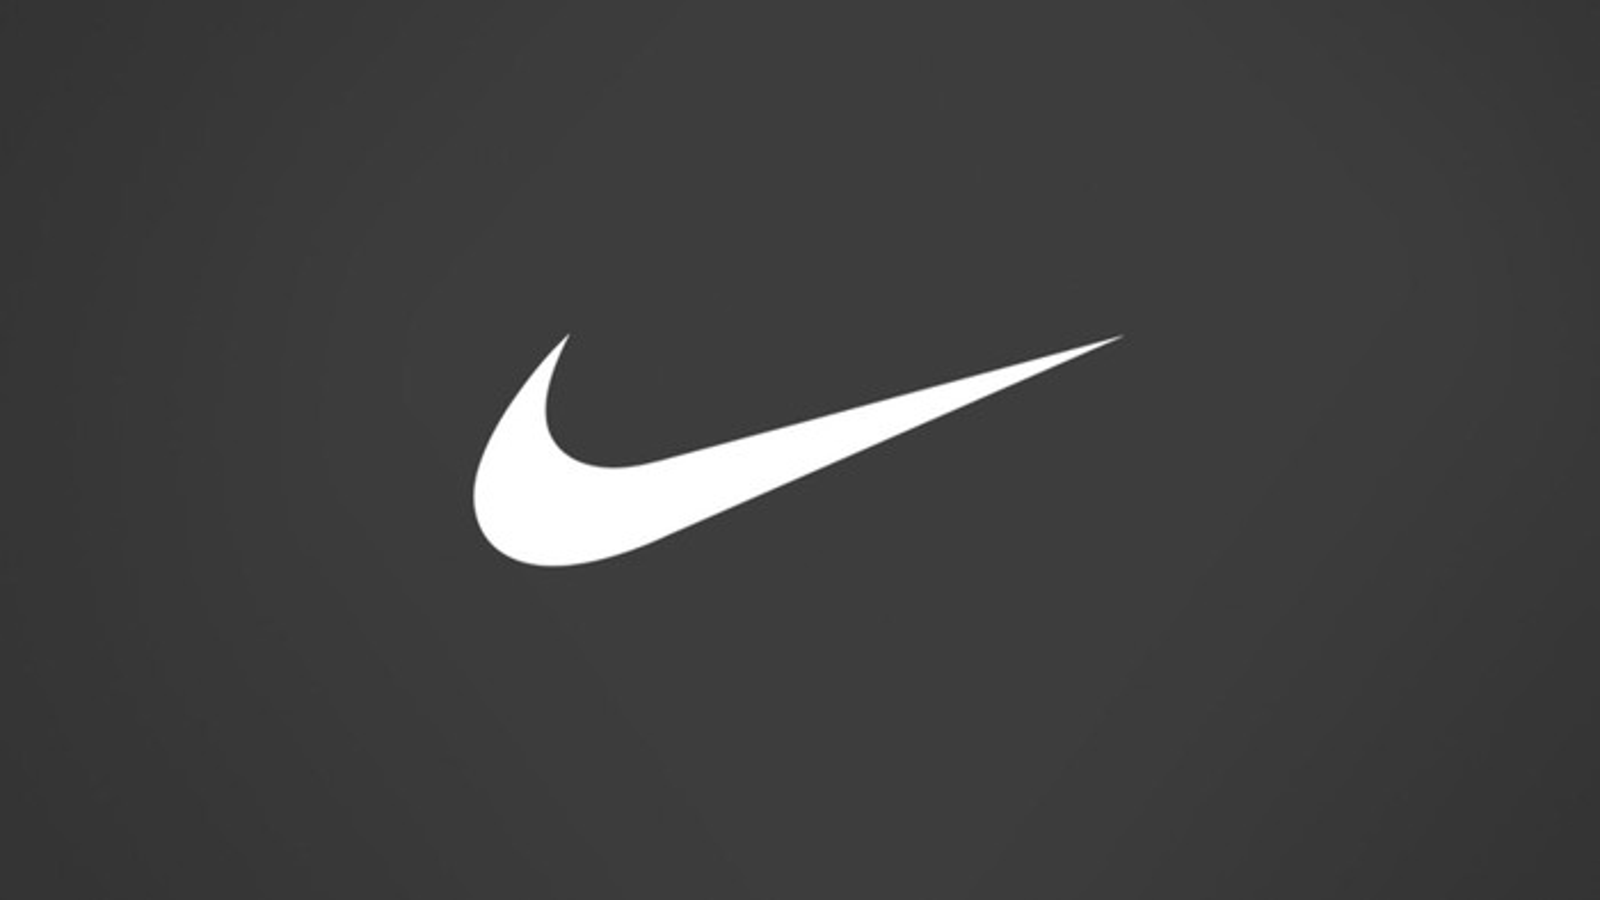 White Nike swoosh logo on dark background